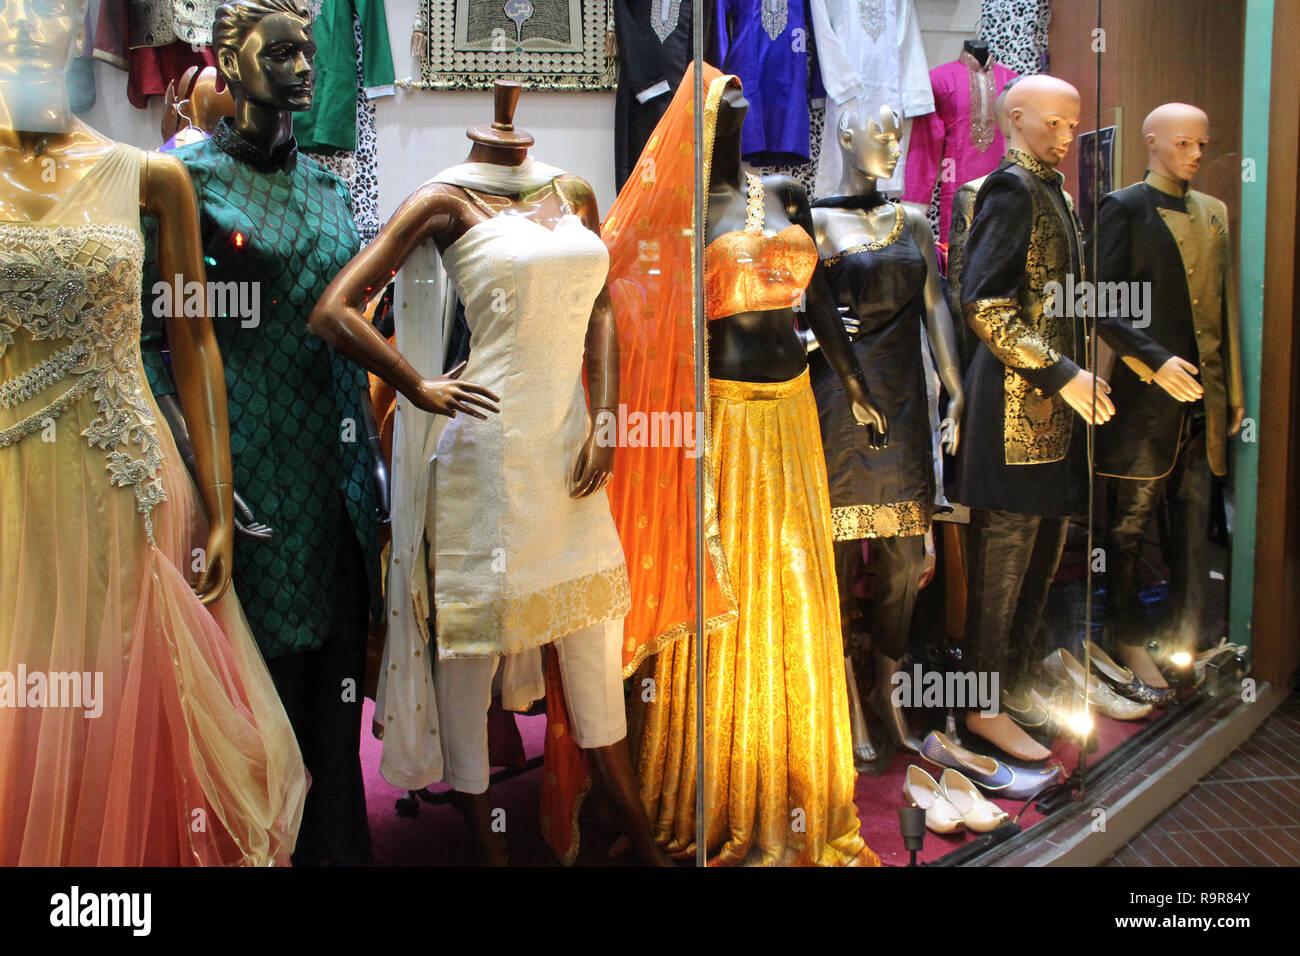 de6eac894ea Indian Clothes Shop Window Stock Photos   Indian Clothes Shop Window ...